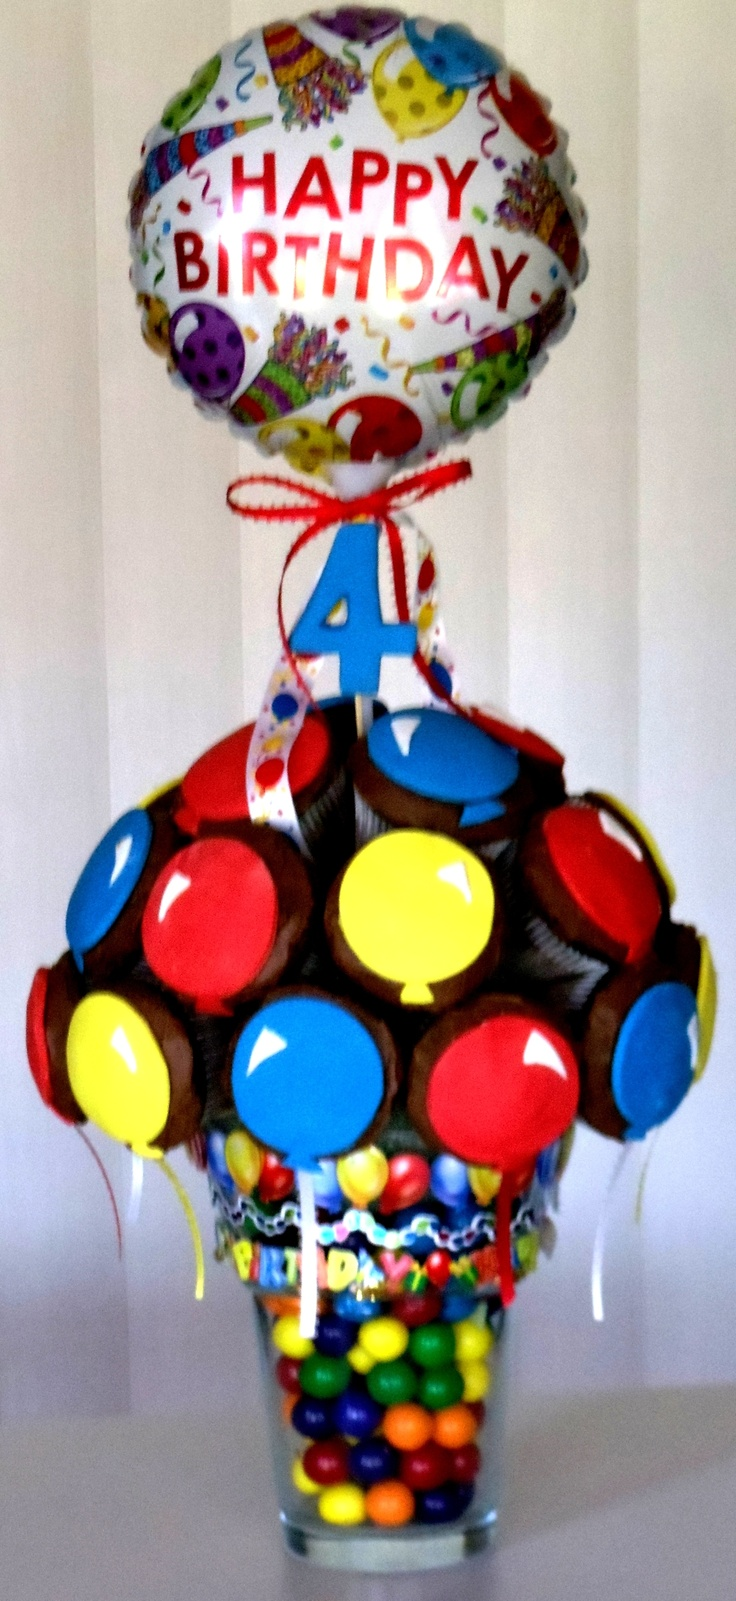 Cupcake Bouquet - Birthday